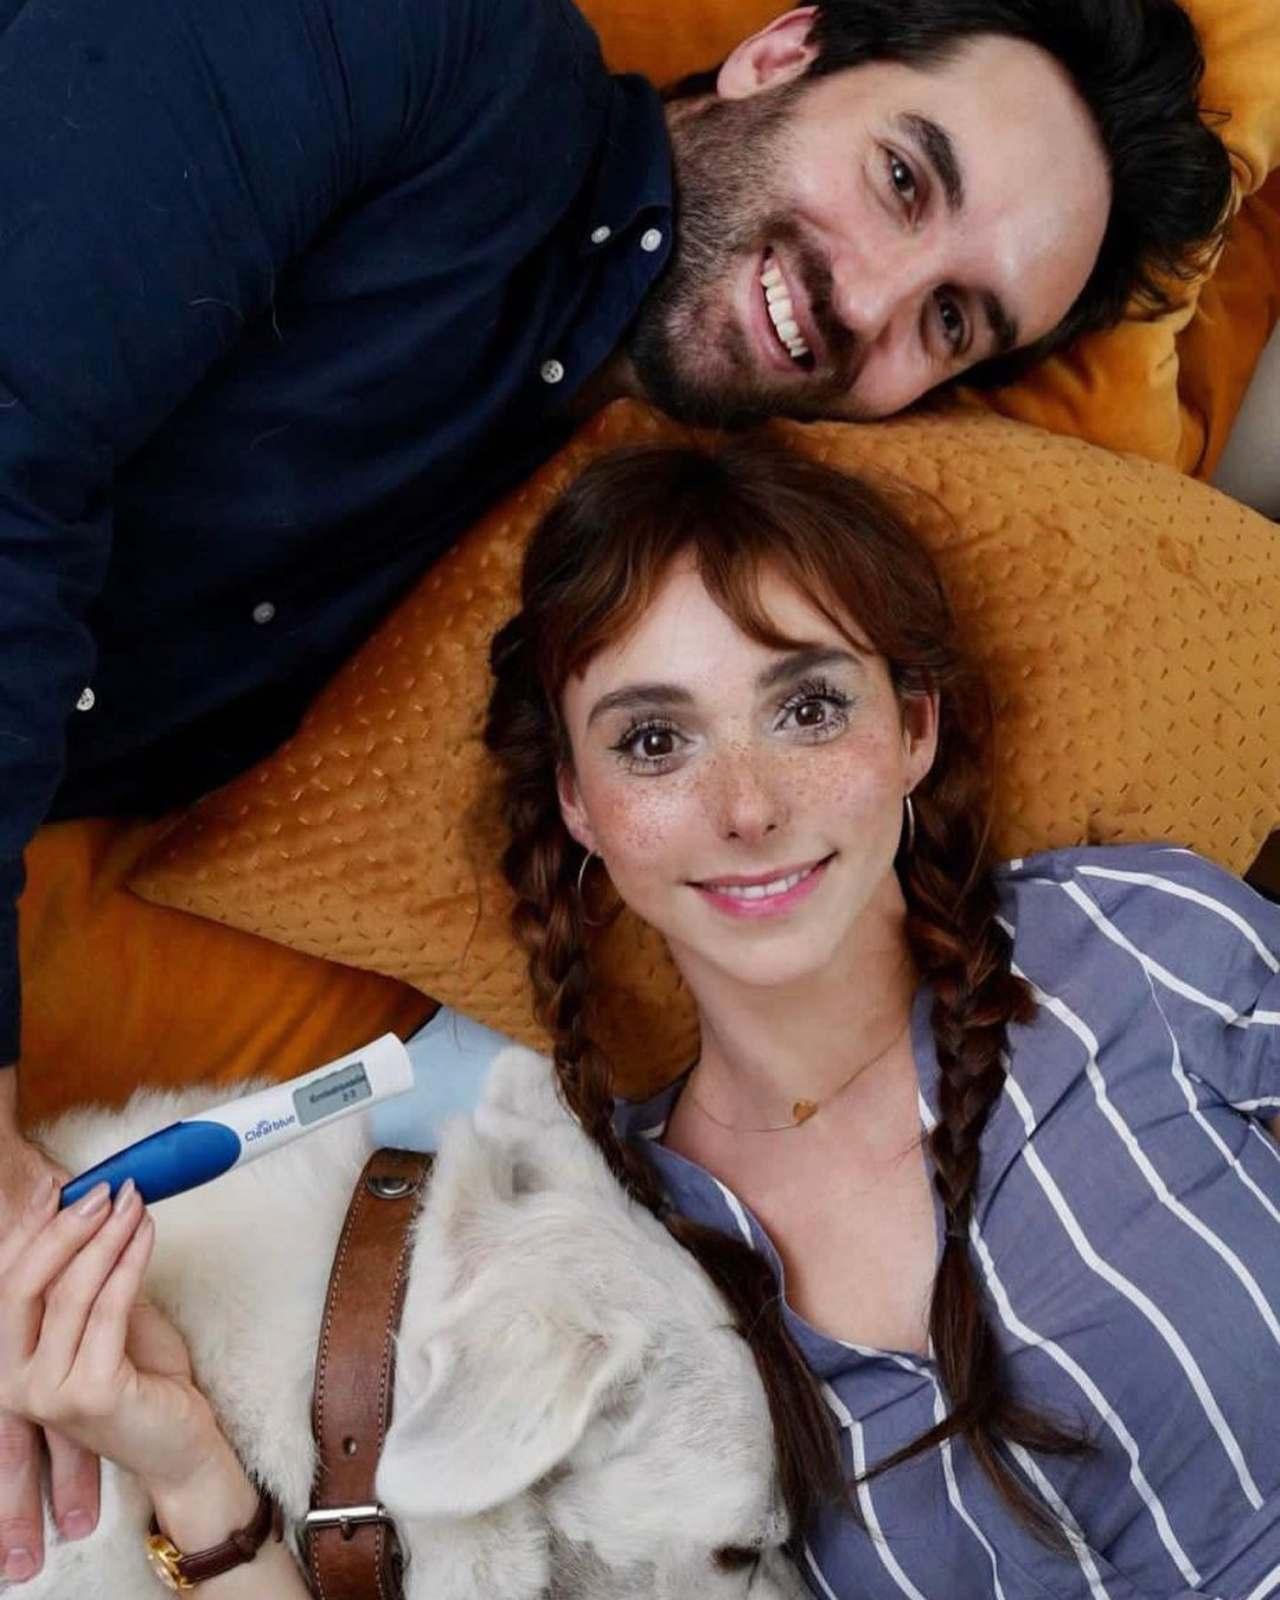 Natalia Tellez aborto legal estando embarazada